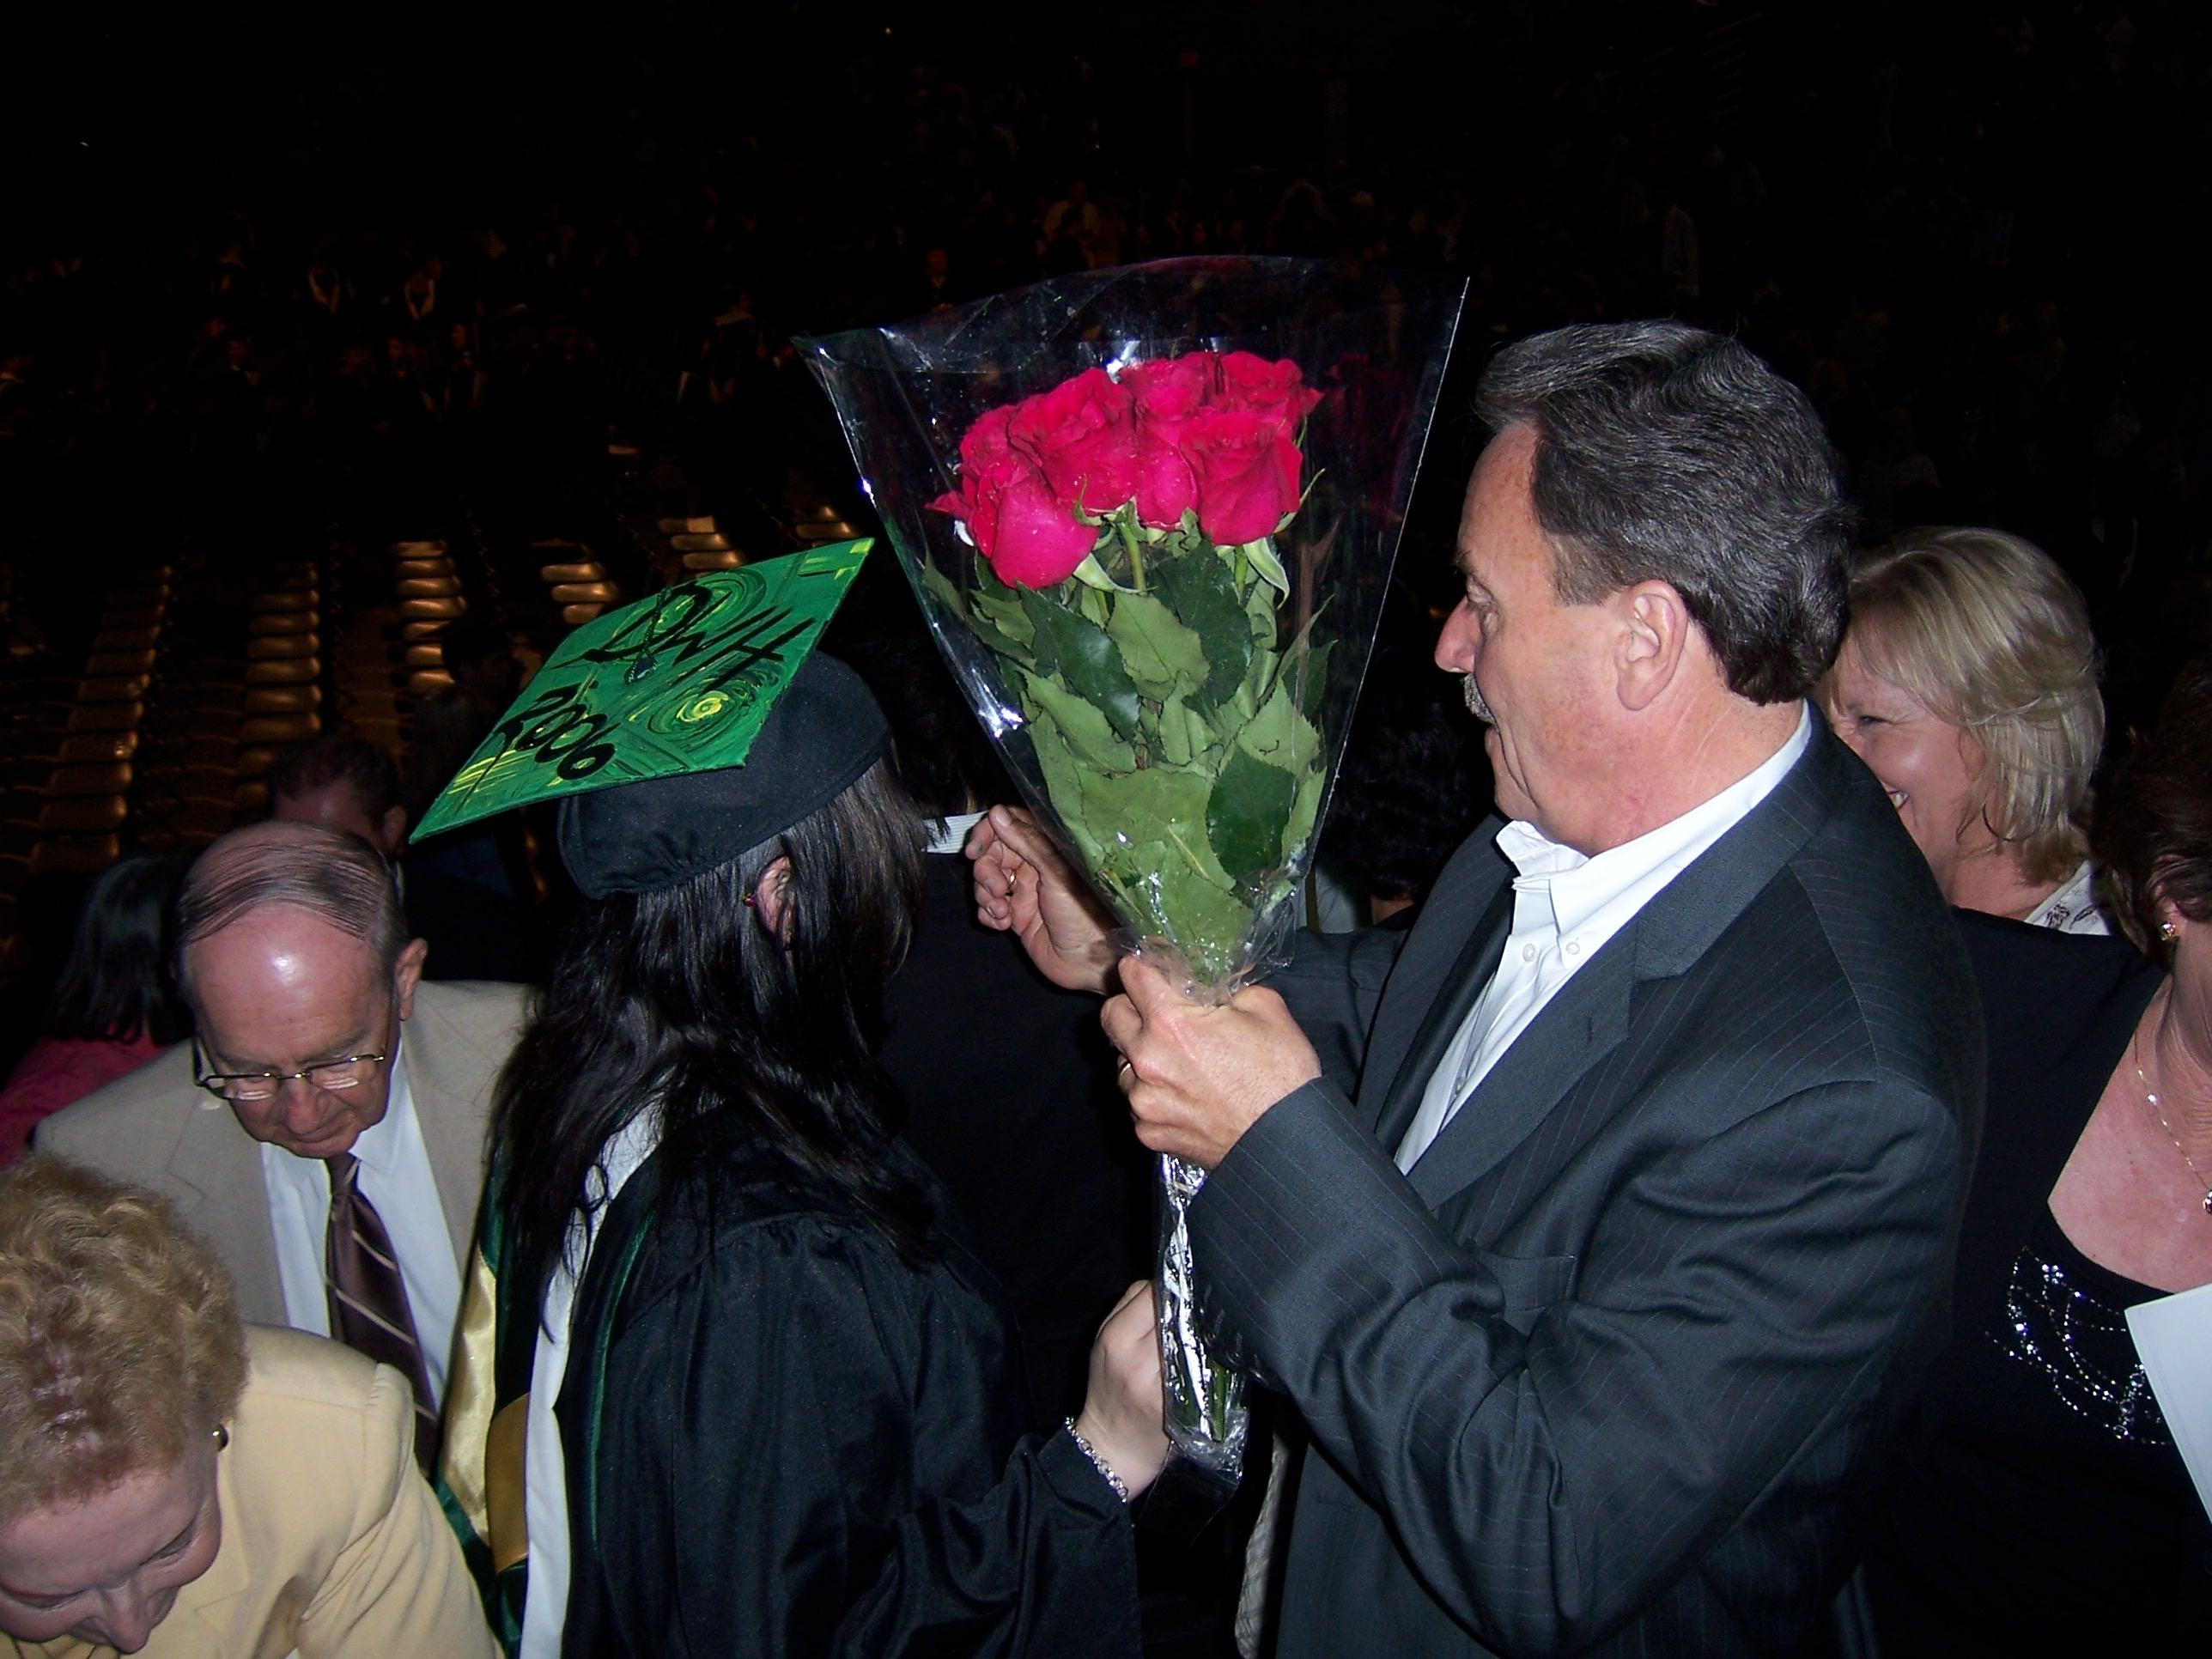 proud dad presenting roses